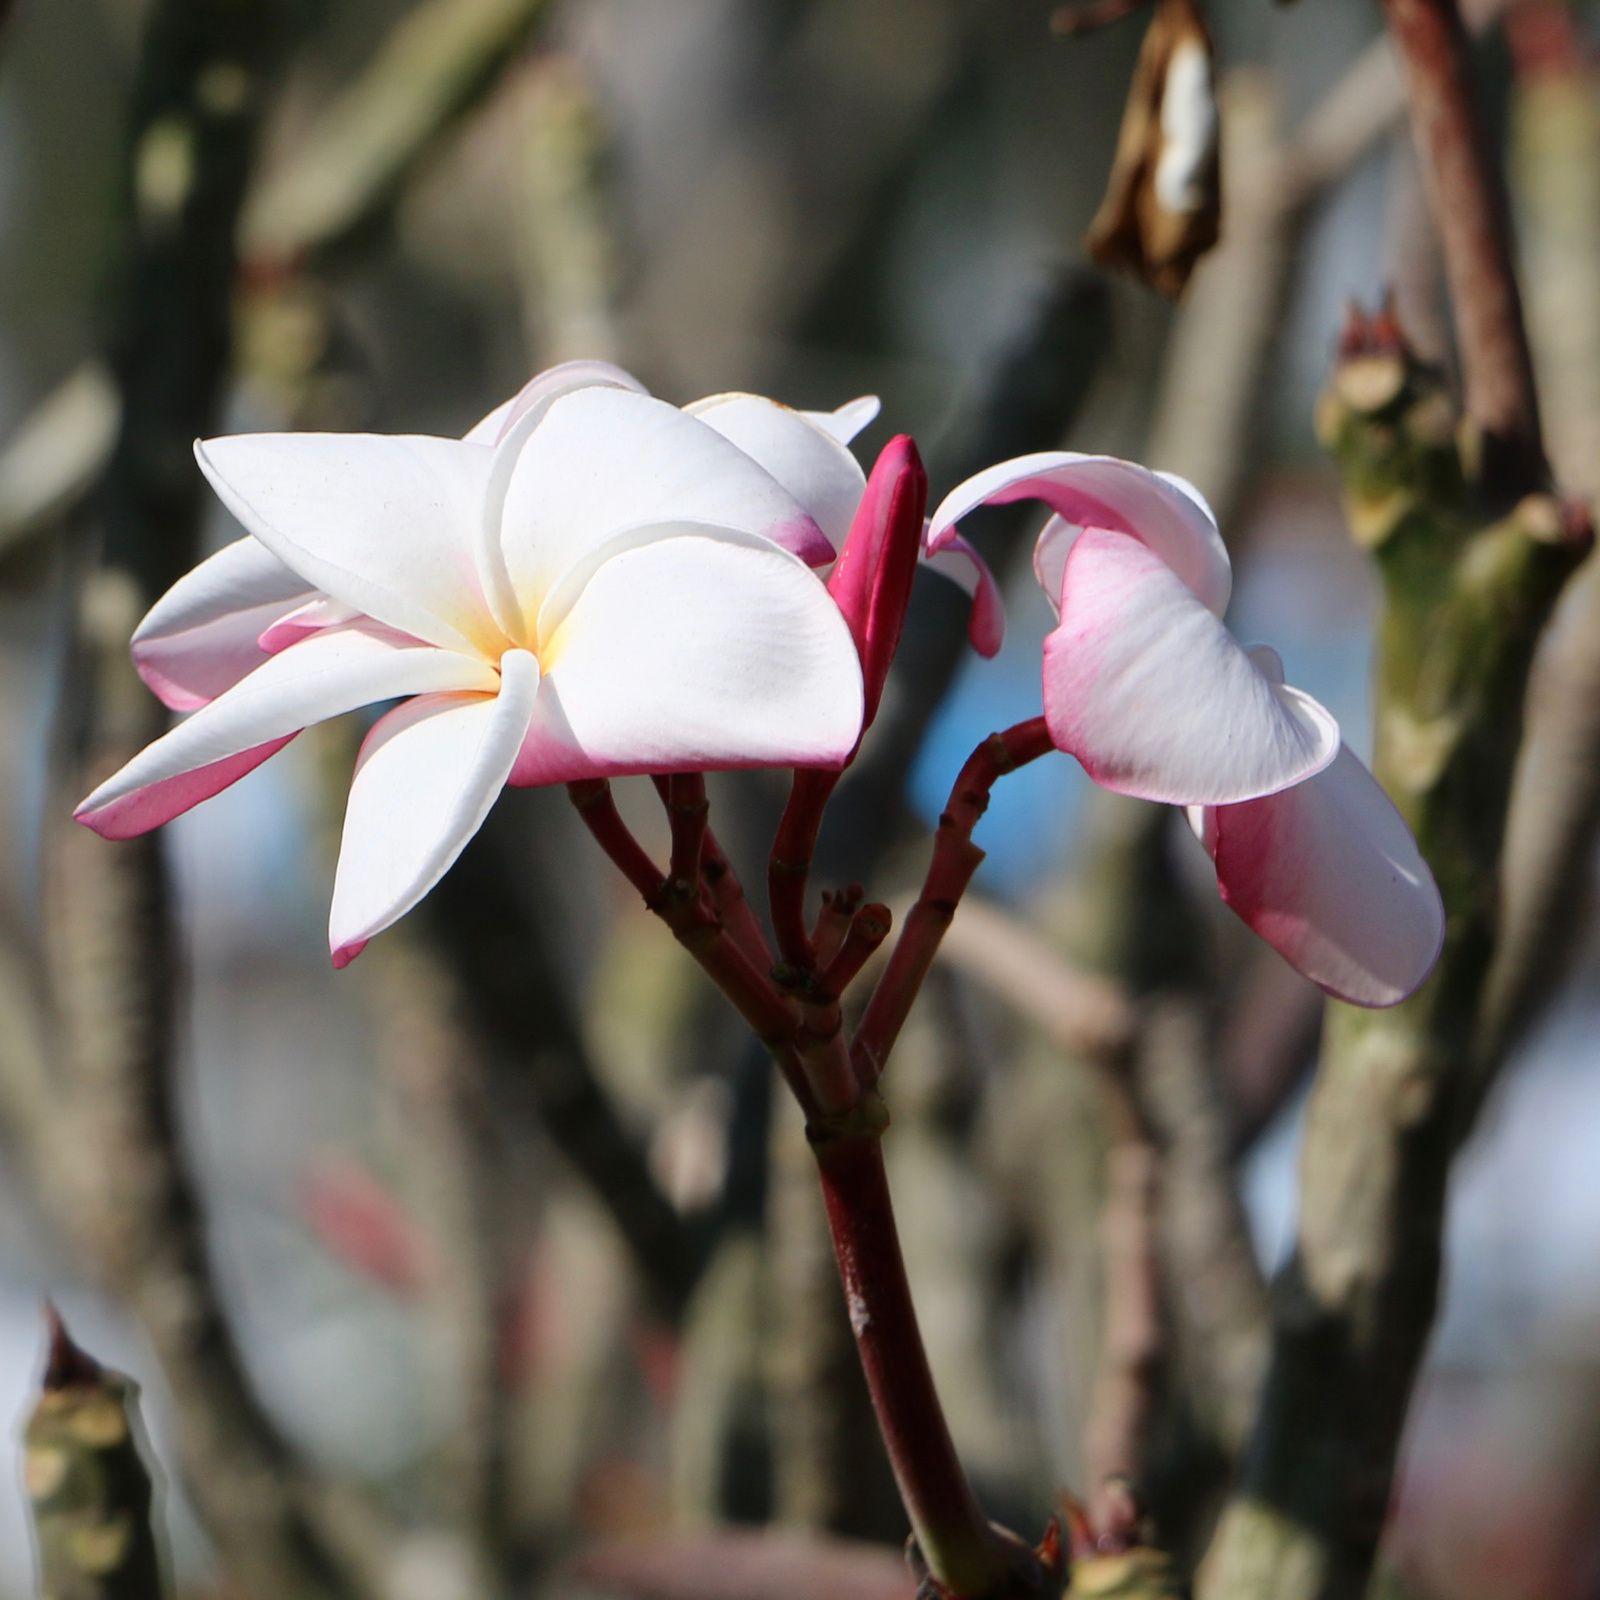 Frangipagne blanche (Plumeria subsessilis), Laos, 24/11/19